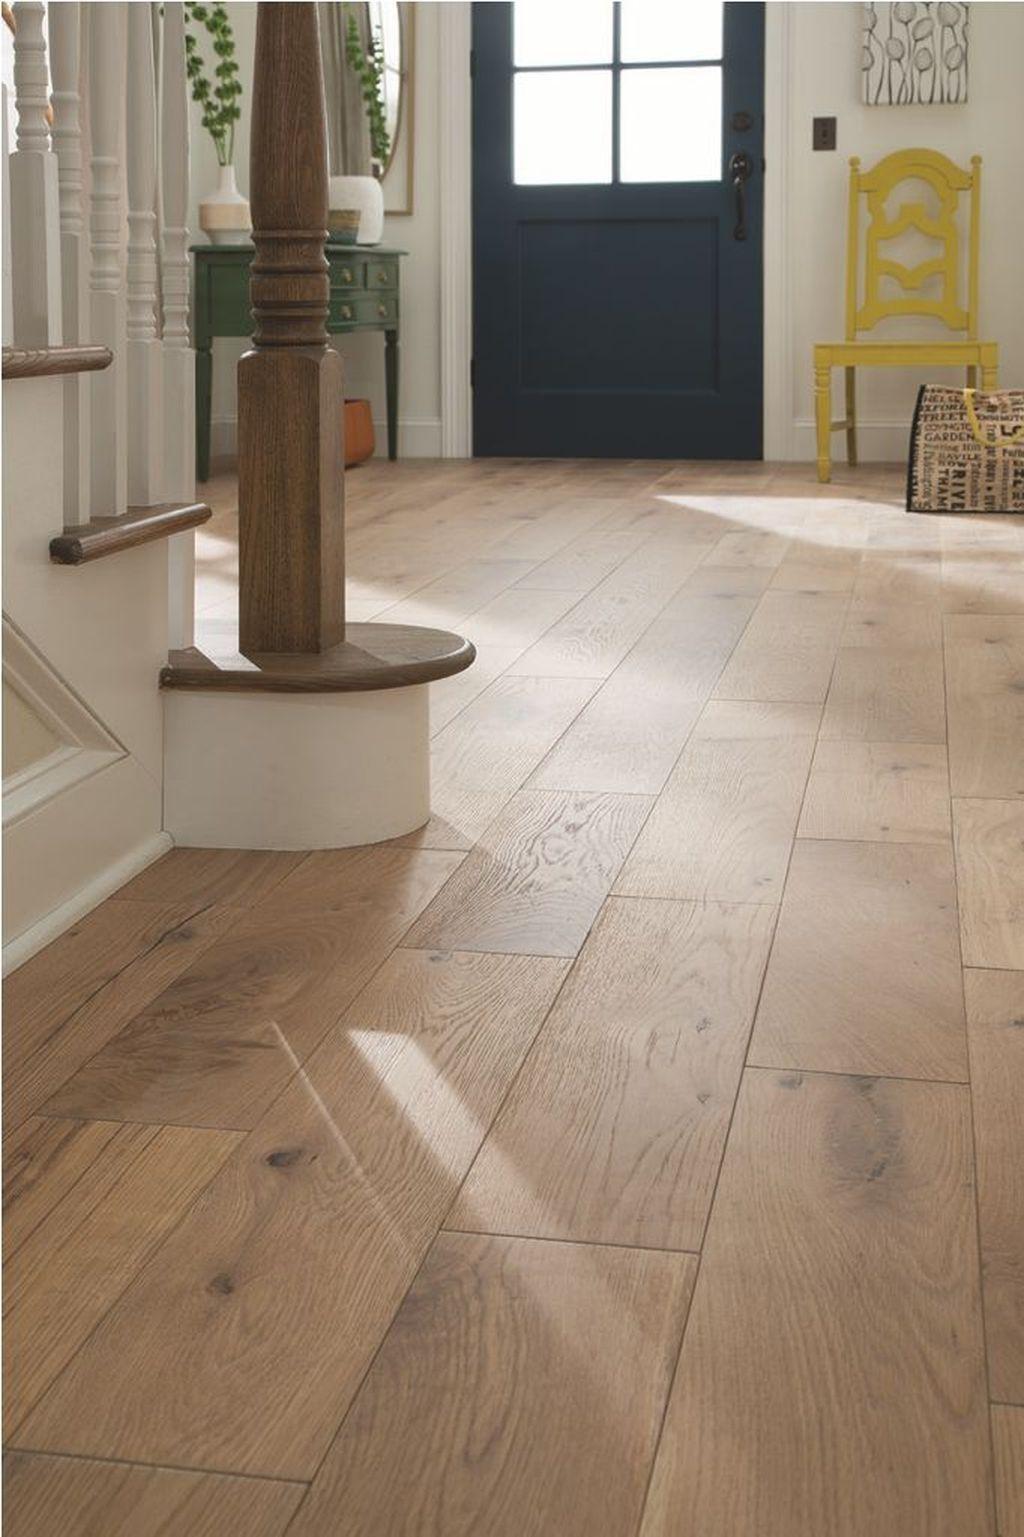 33 Comfy Small Home Interior Design Ideas With Very Amazing Wood Floor White Oak Hardwood Floors Wood Floors Wide Plank Oak Hardwood Flooring